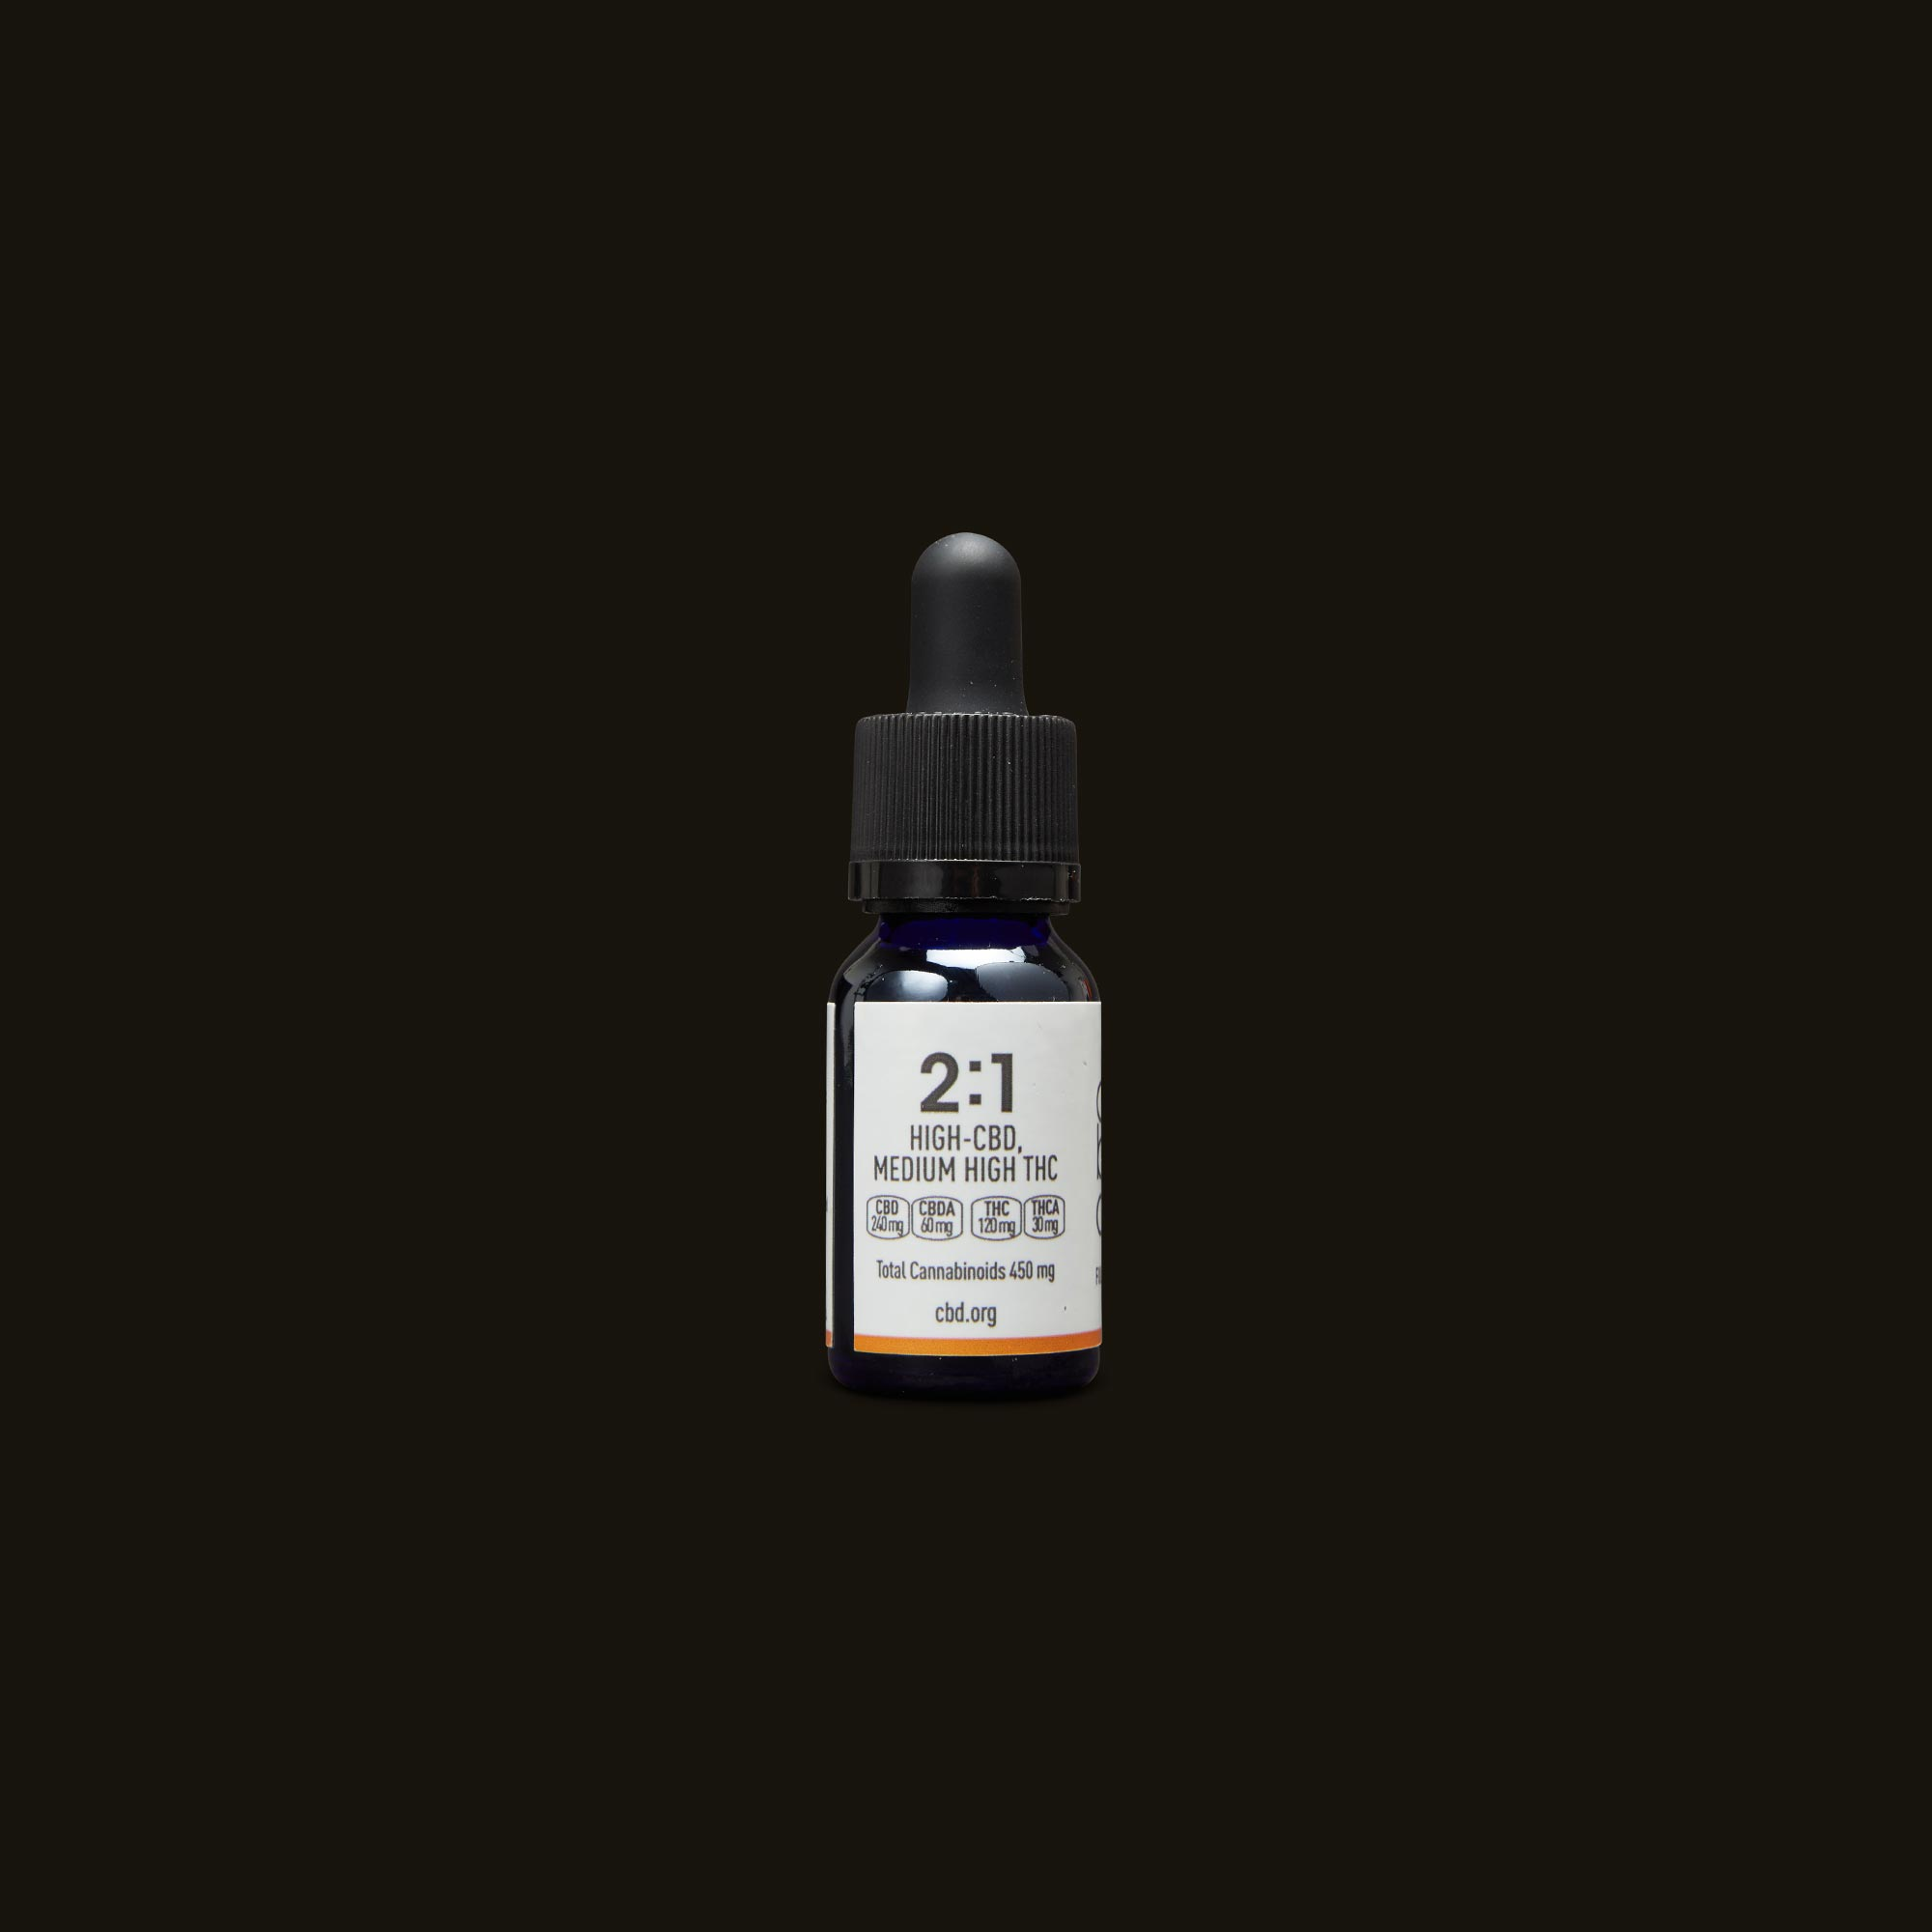 Care By Design 2:1 Full Spectrum CBD Drops - 0.5oz Back Tincture